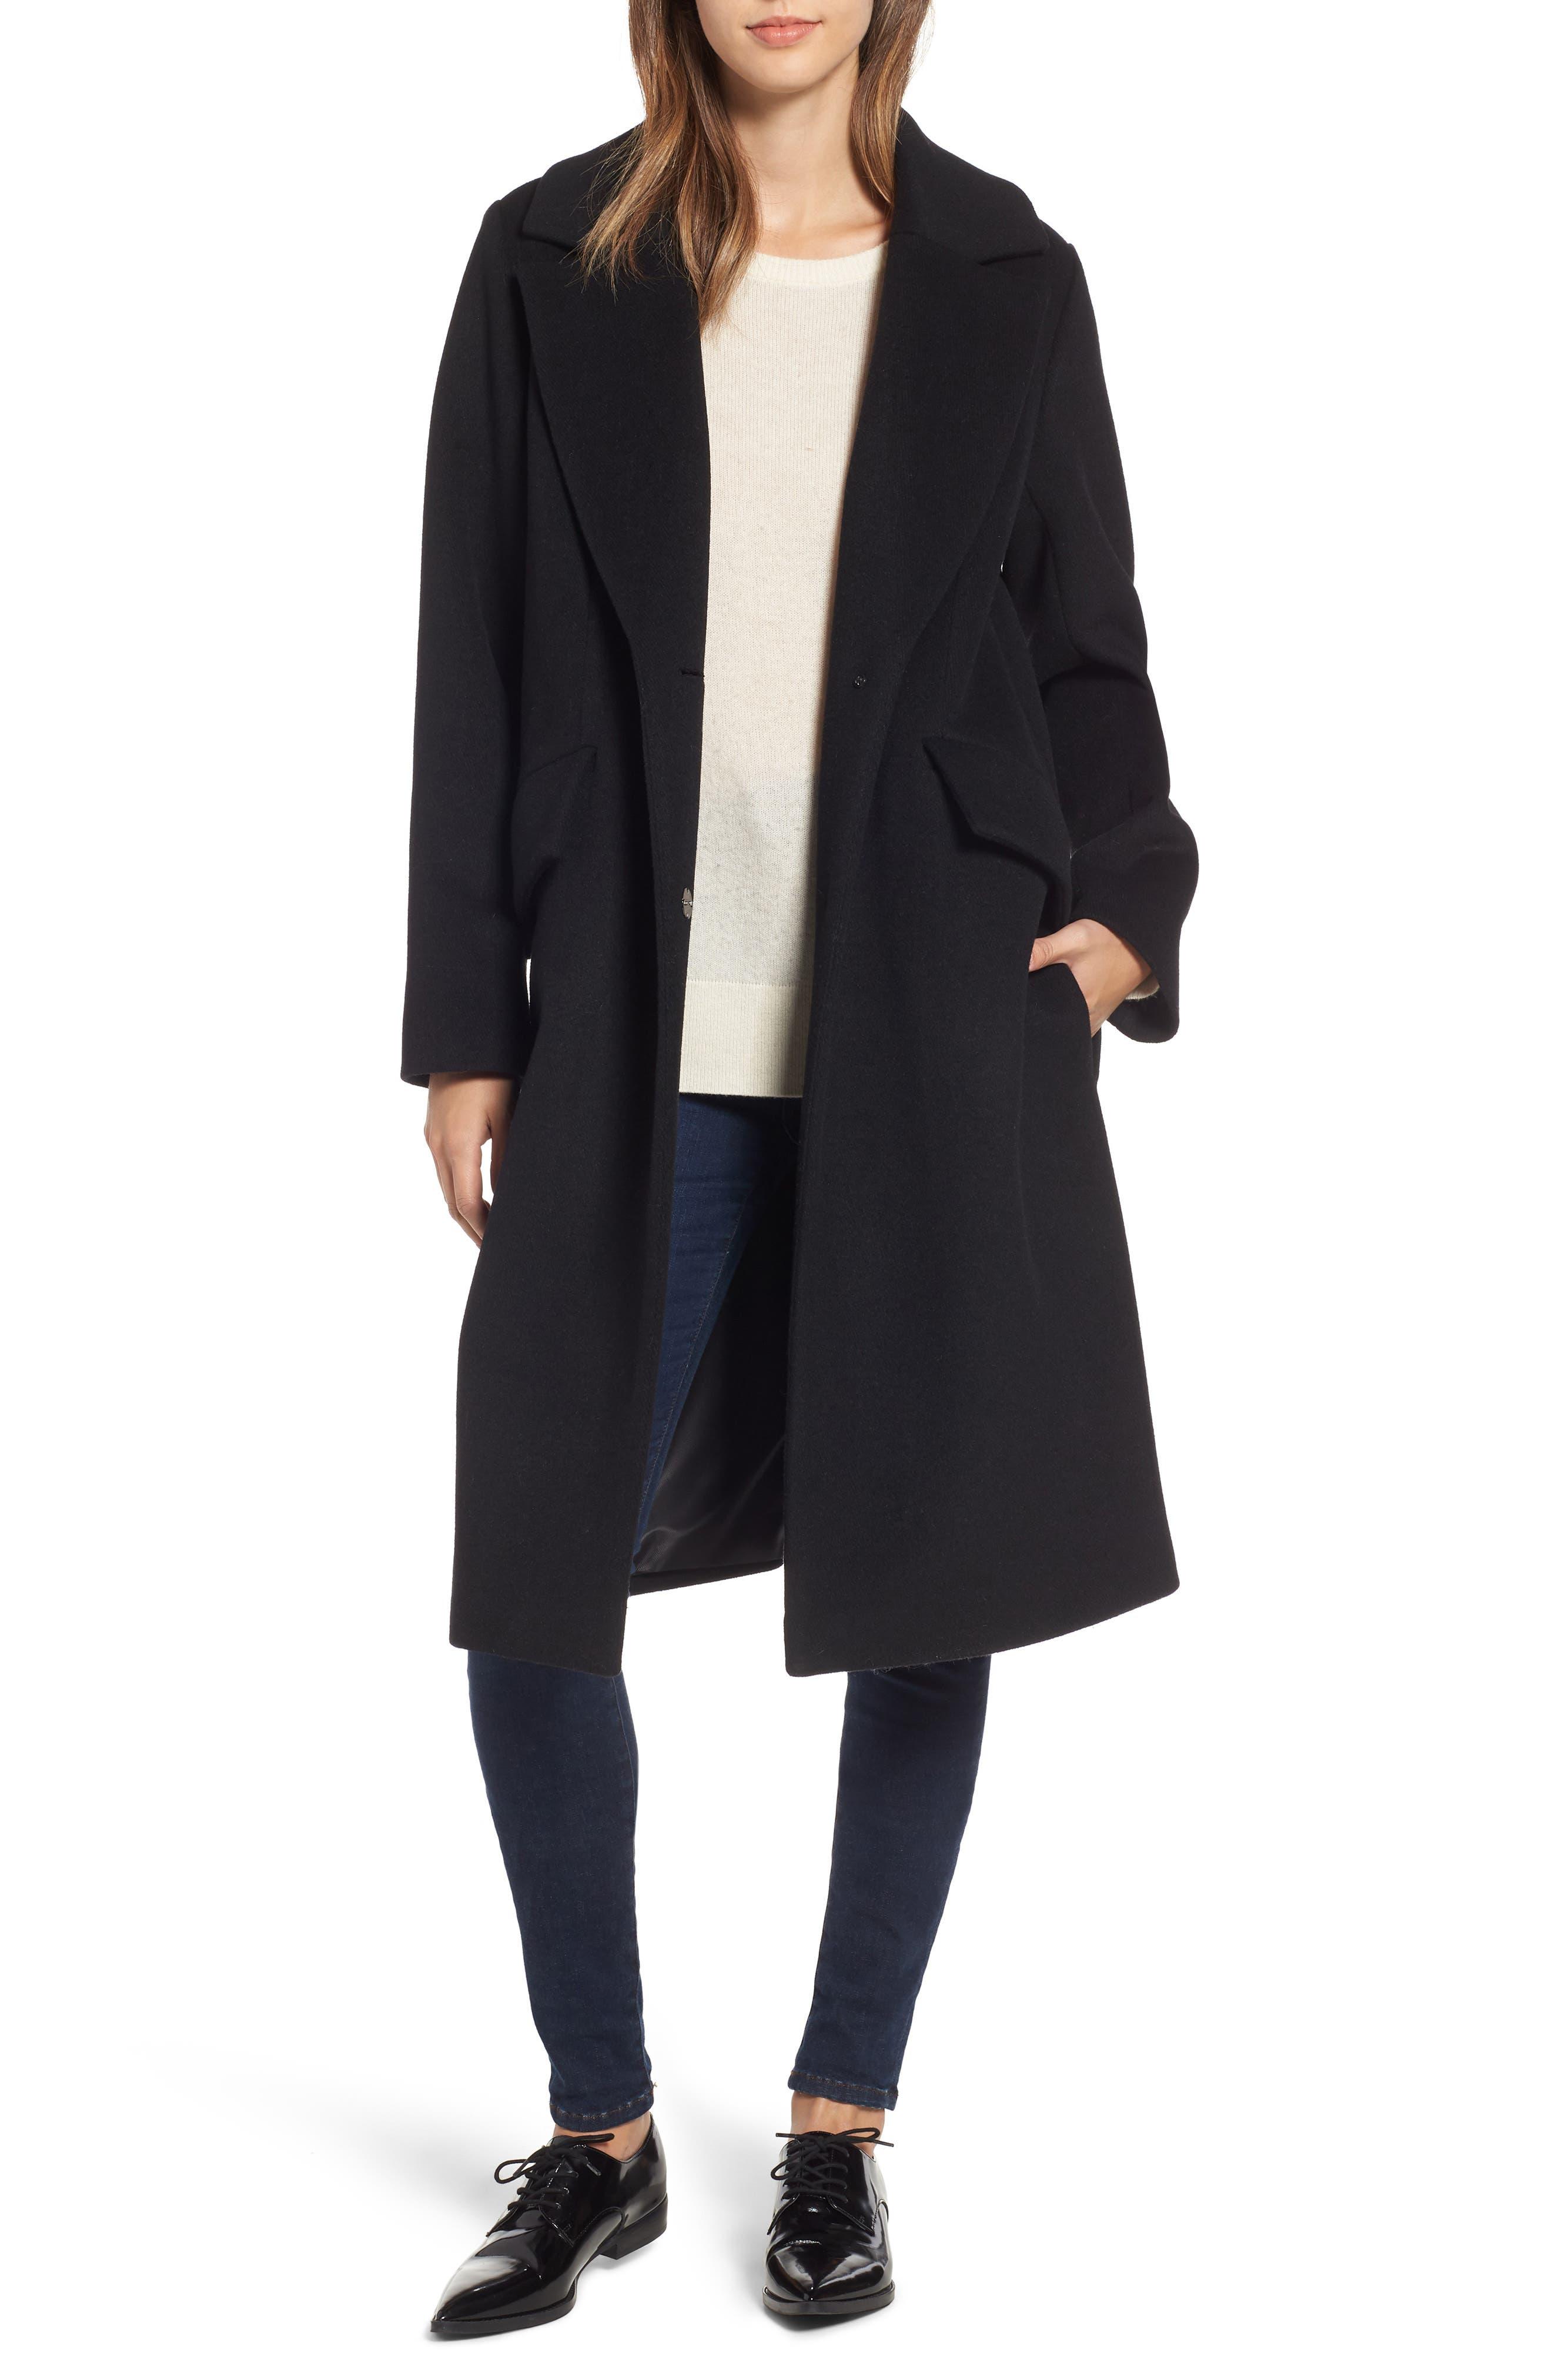 RACHEL RACHEL ROY, Wool Blend Coat, Main thumbnail 1, color, BLACK